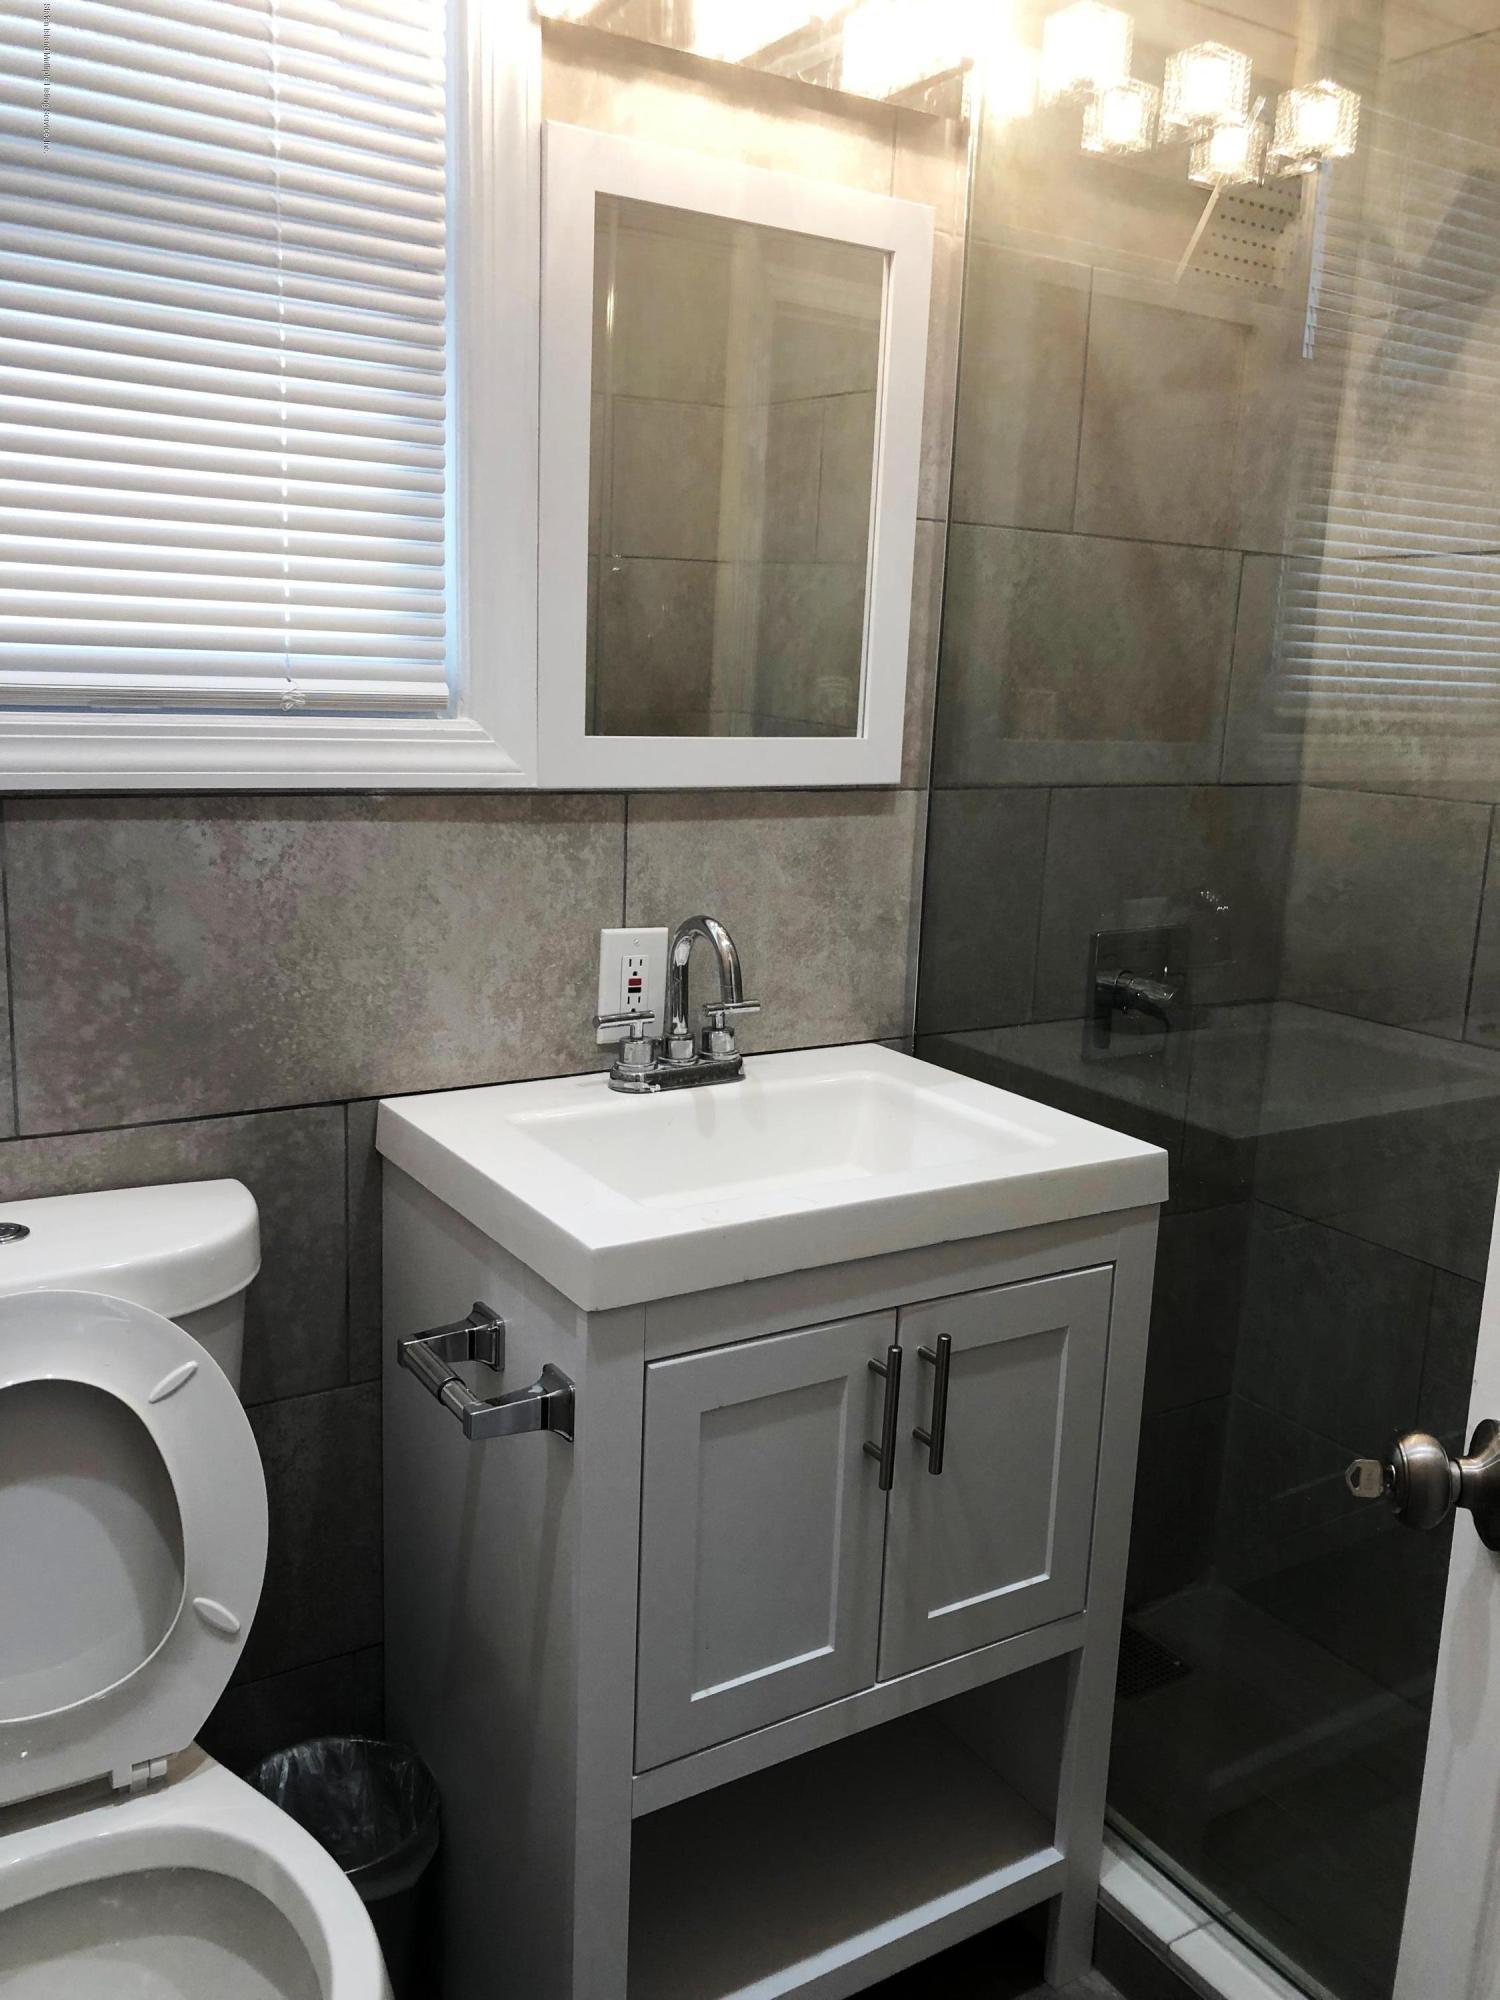 2fl 37 Scarboro Avenue,Staten Island,New York,10305,United States,3 Bedrooms Bedrooms,6 Rooms Rooms,1 BathroomBathrooms,Res-Rental,Scarboro,1128947